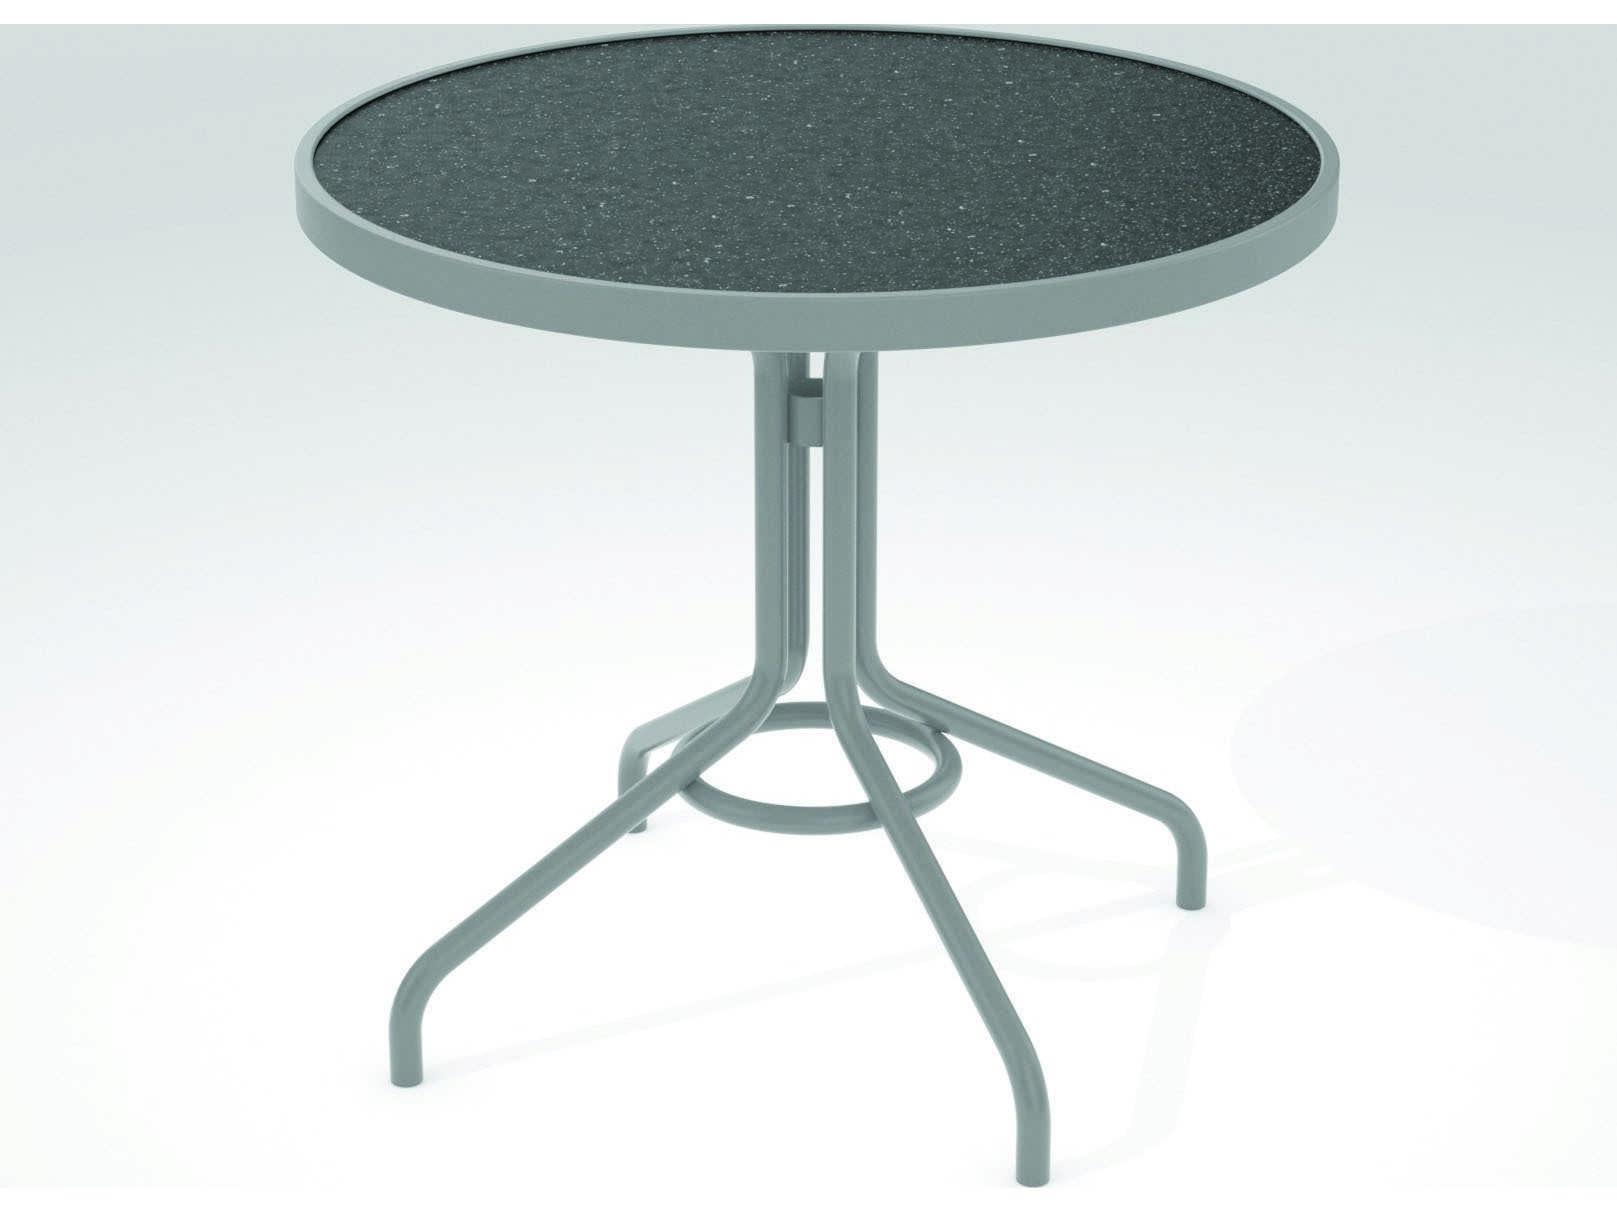 Tropitone Hpl Raduno Aluminum 30 Round Dining Table 656h